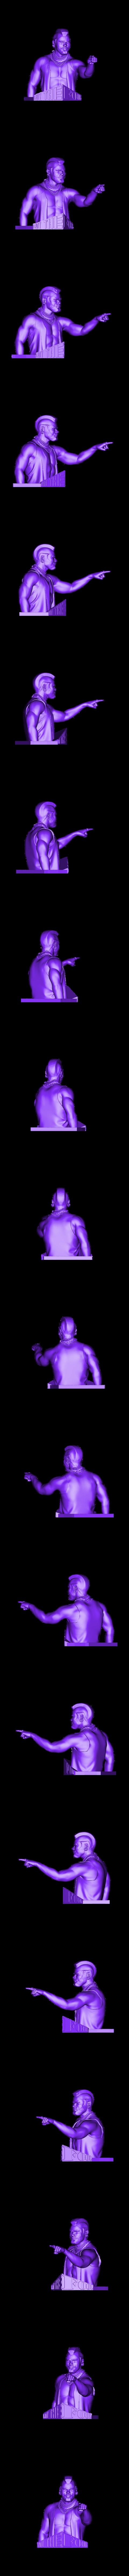 Barracuda.stl Download STL file Mr. T Barracuda • 3D printer design, Snorri